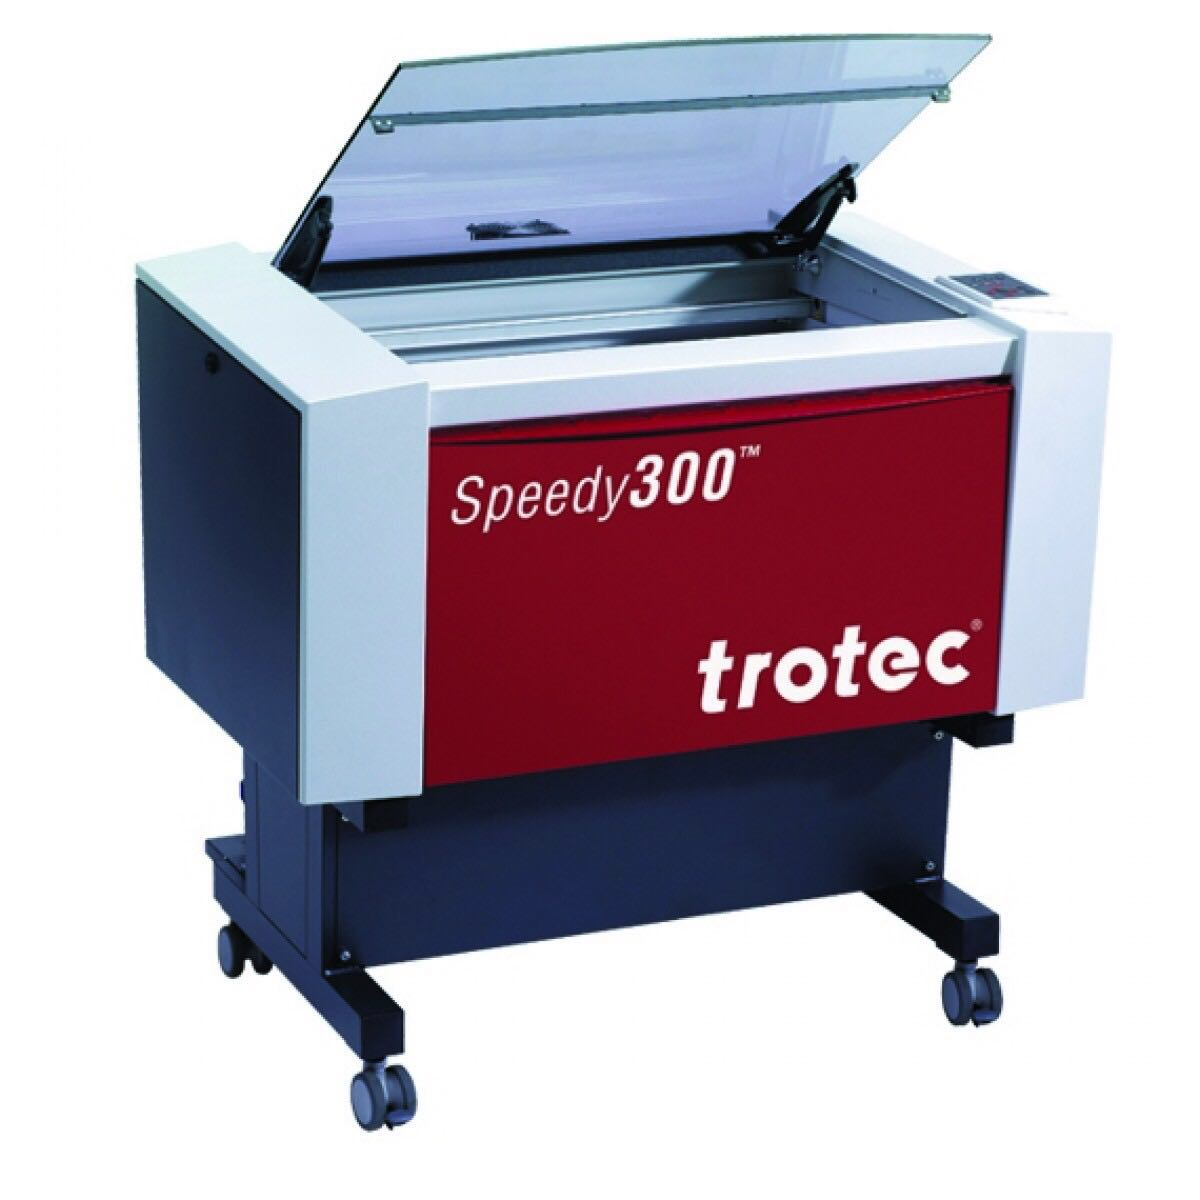 Trotec Laser Speedy300 30W CO2 laser engraver laser cutter